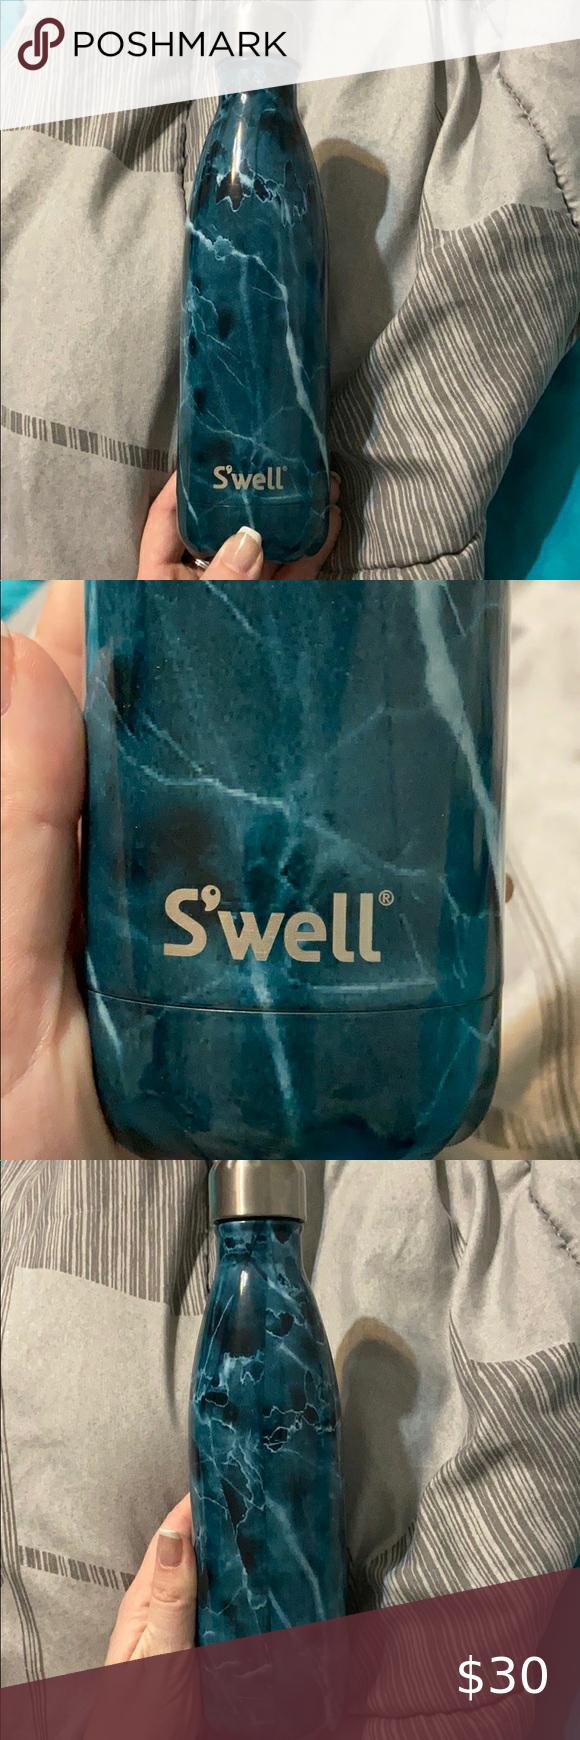 Blue Marble S Well Bottle In 2020 Blue Marble Well Bottle Blue